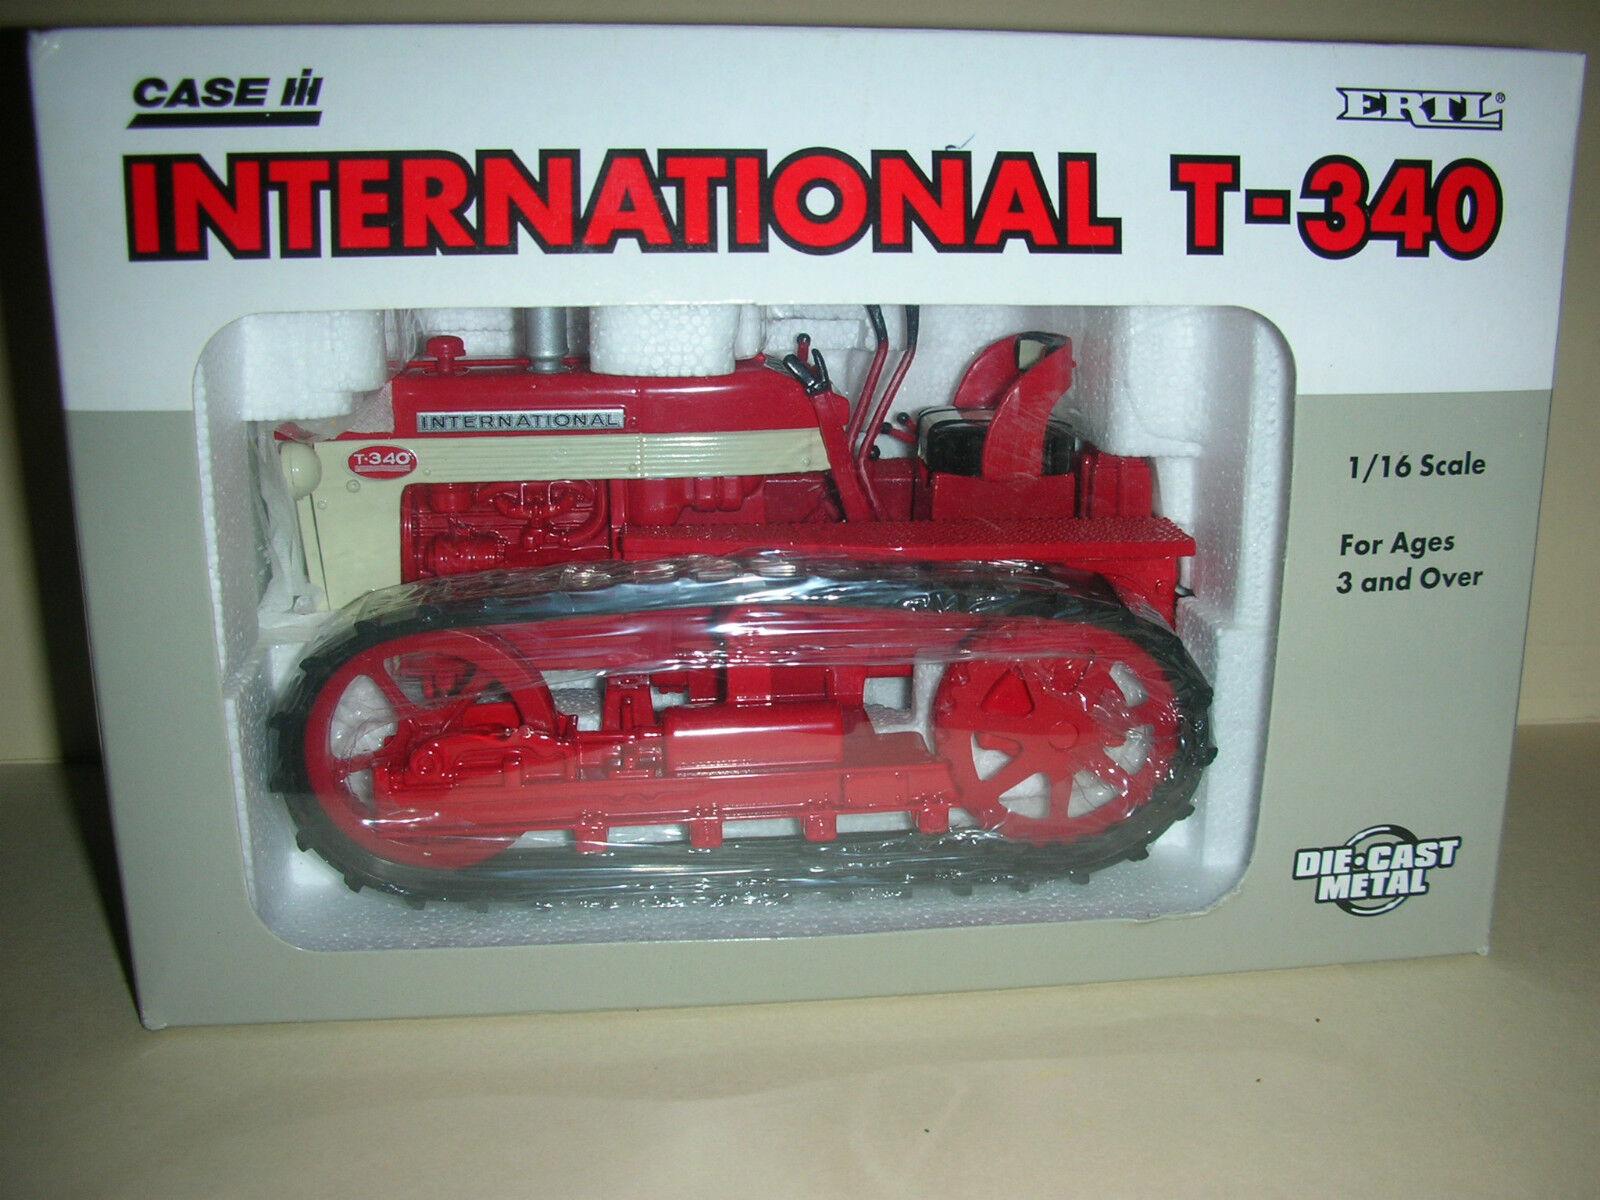 Ertl Usa Funda internacional T-340 Juguete Tractor-Die Cast - 1 16-Escala B 9)